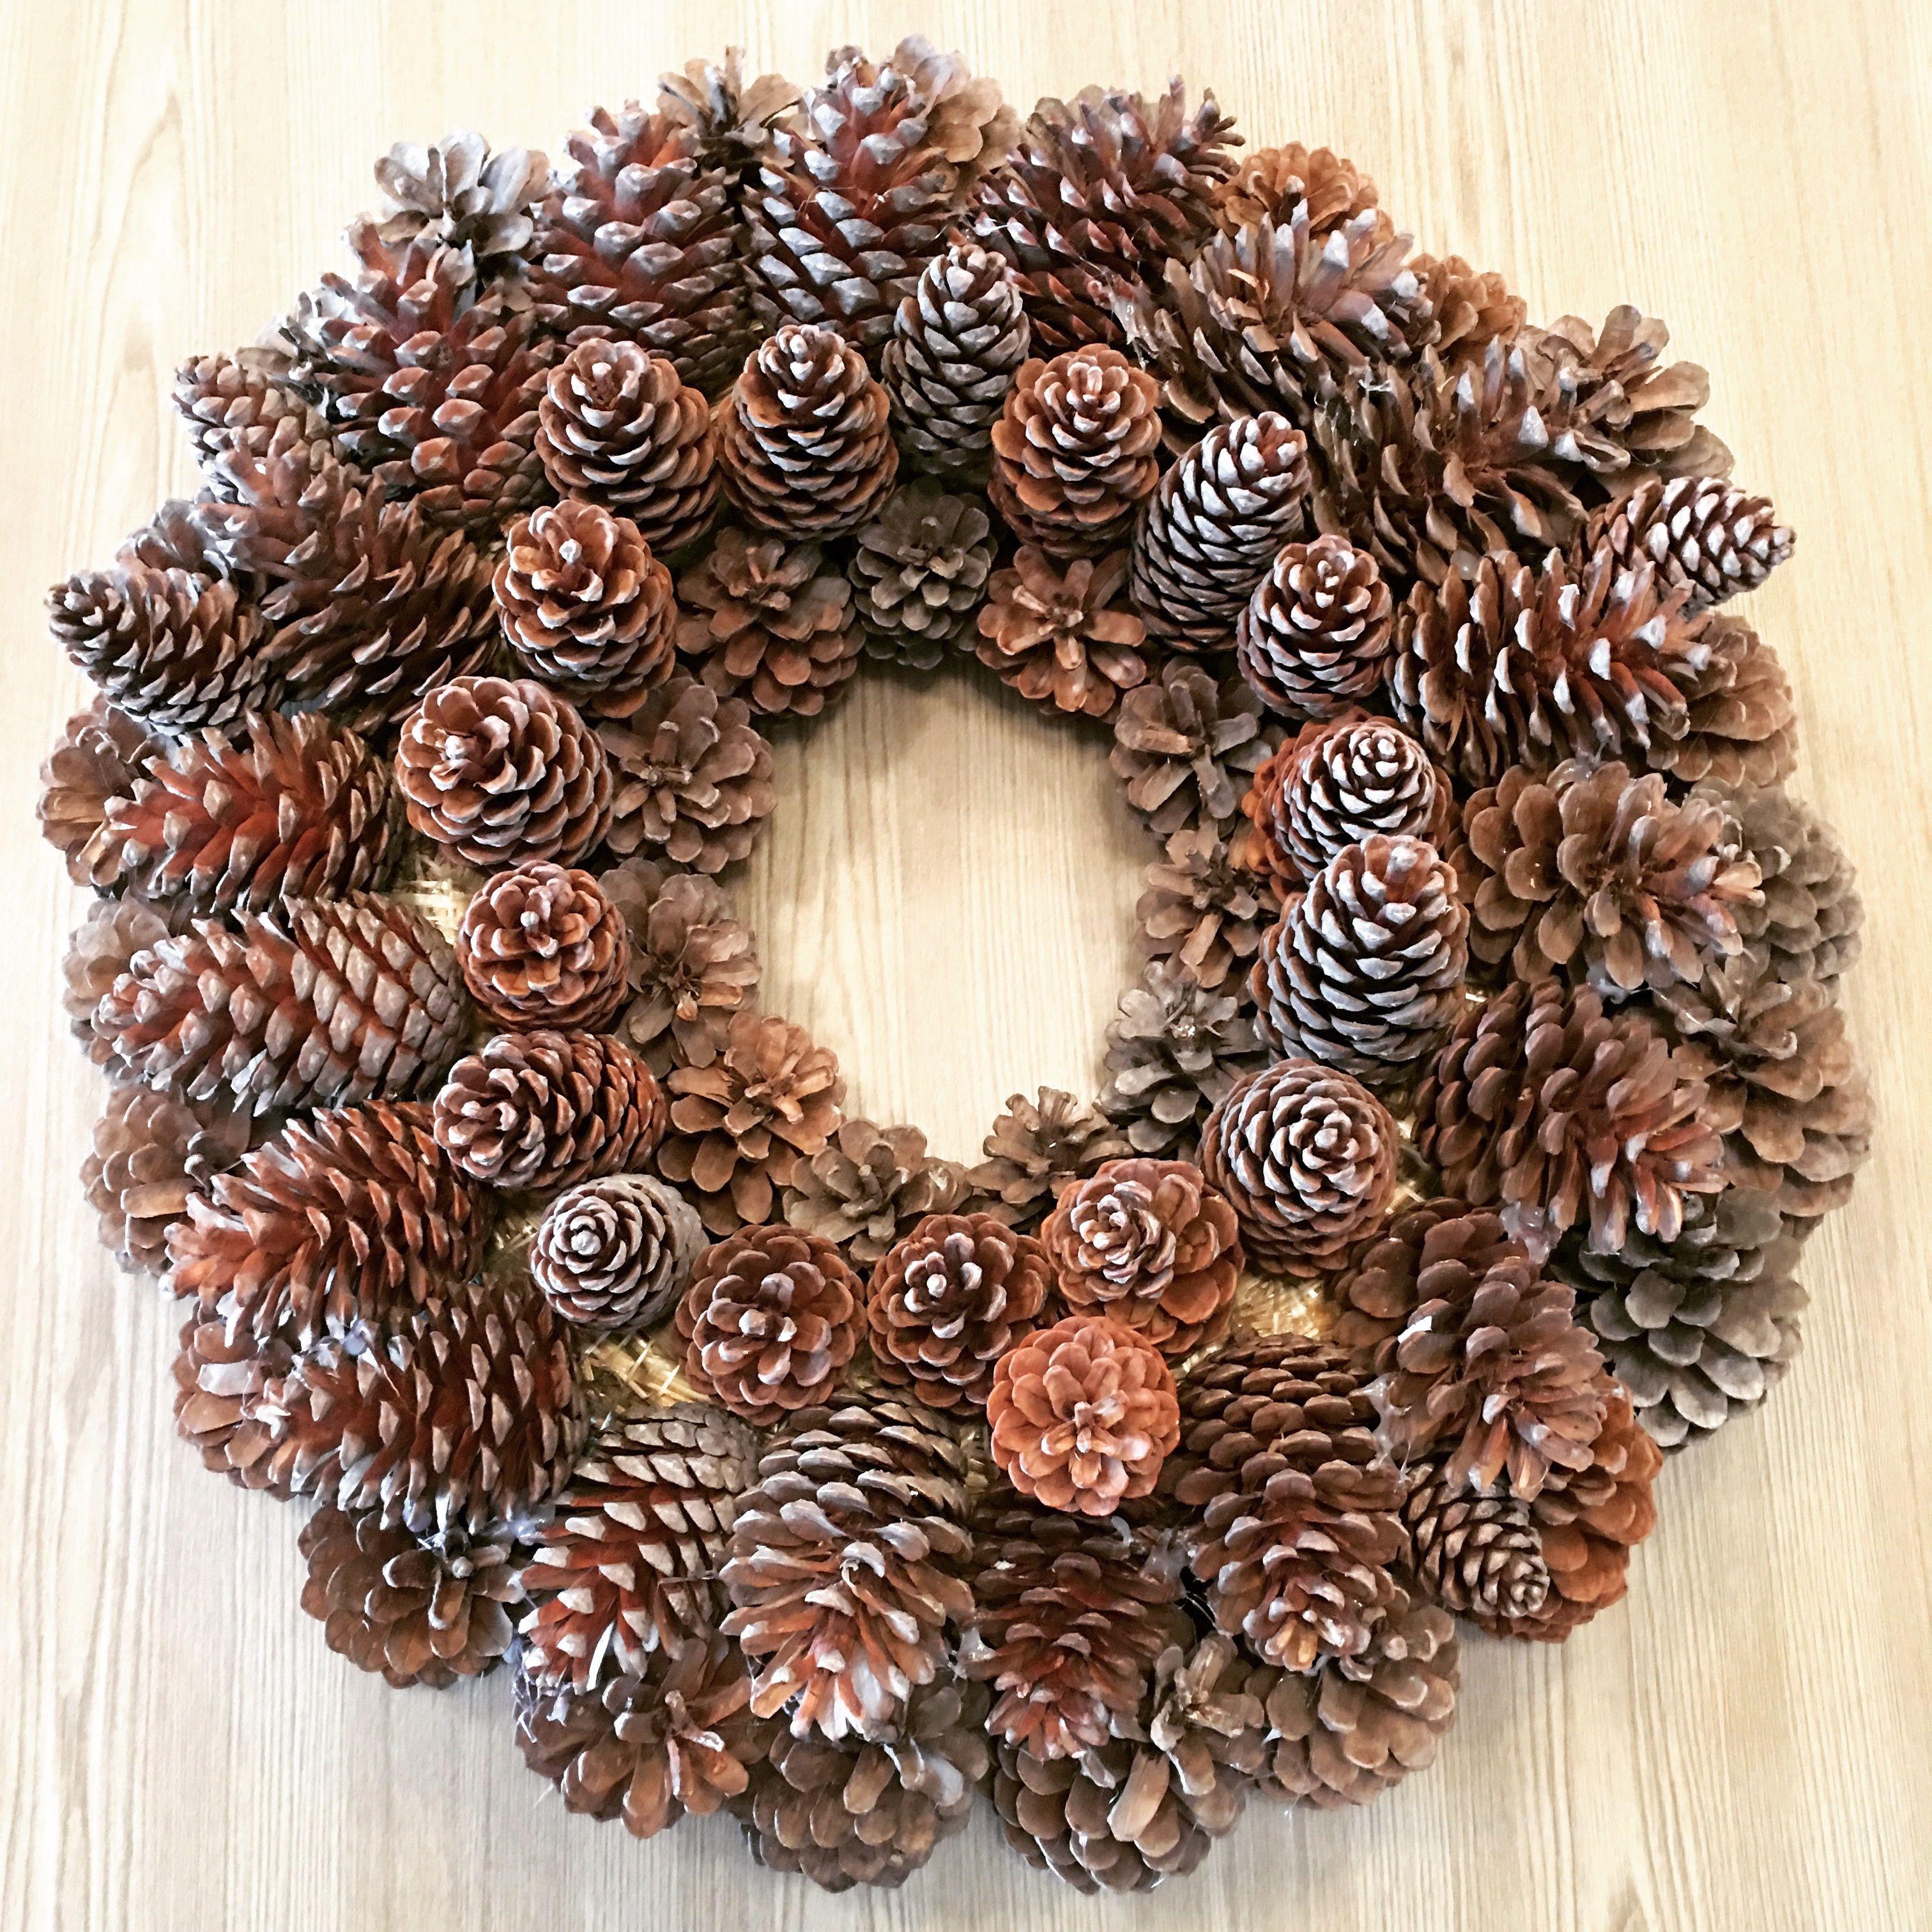 Natural Christmas Decorations